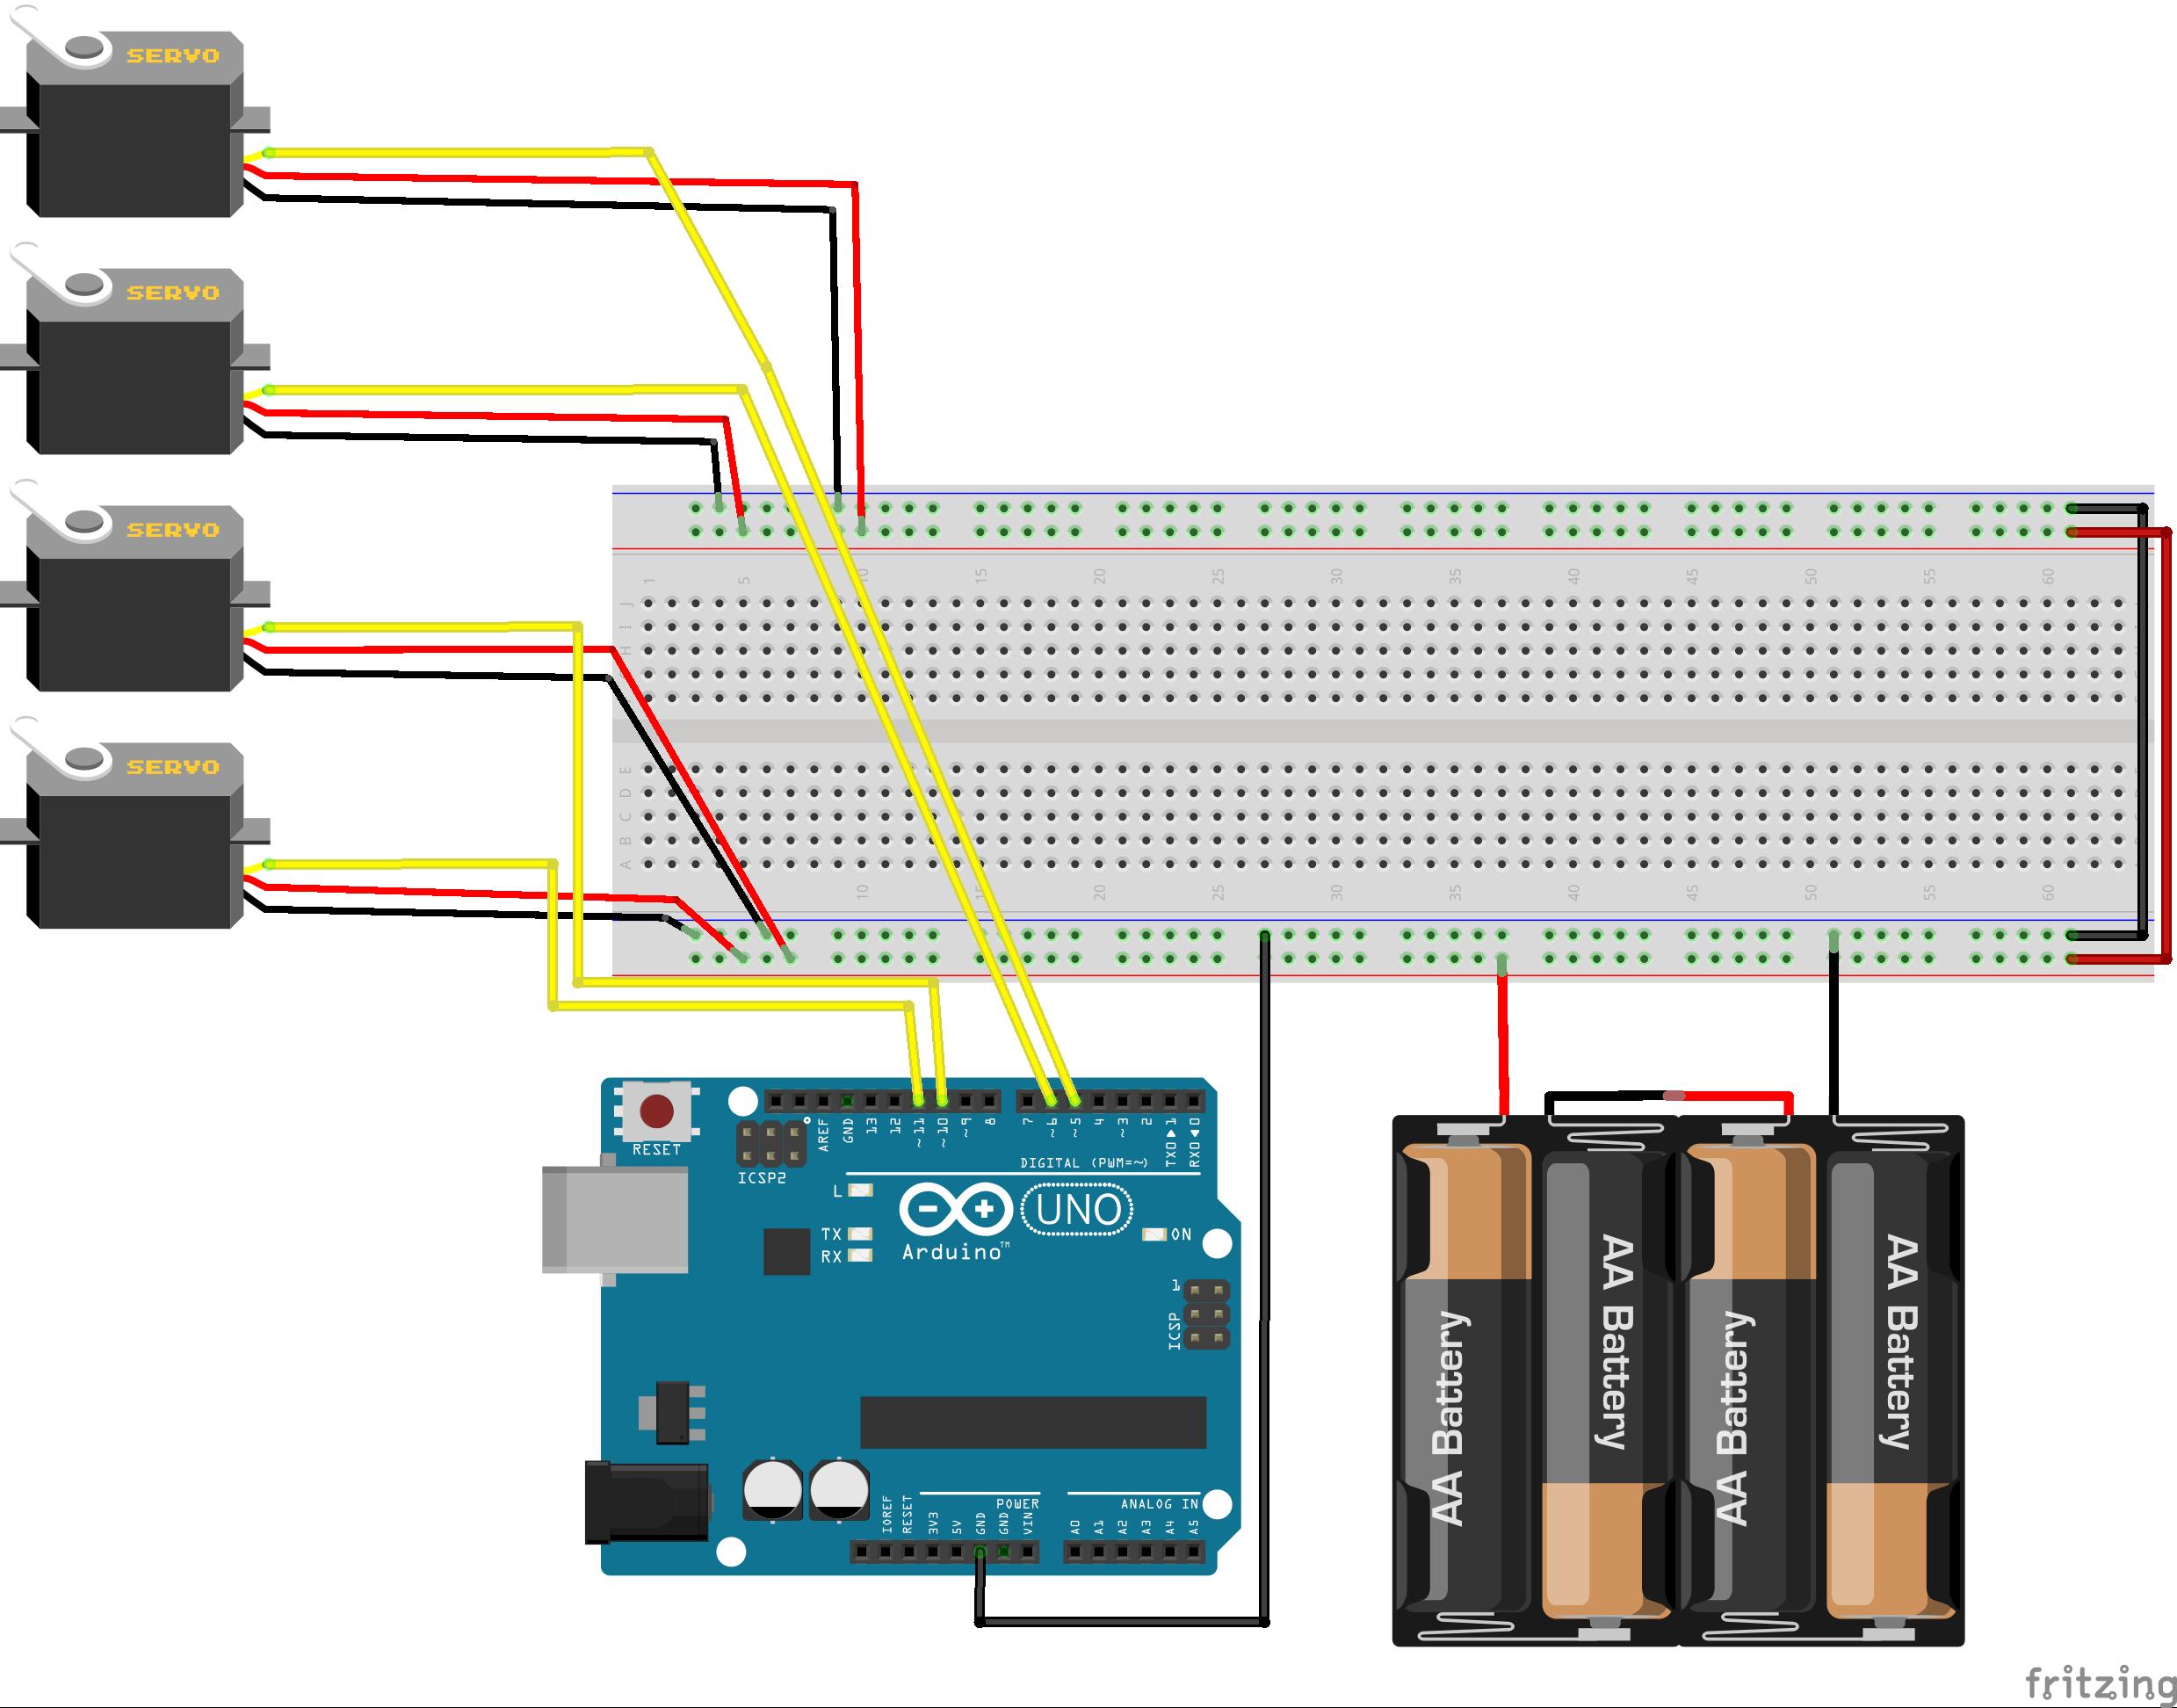 Circuitdesign1 fb6ju39ocp